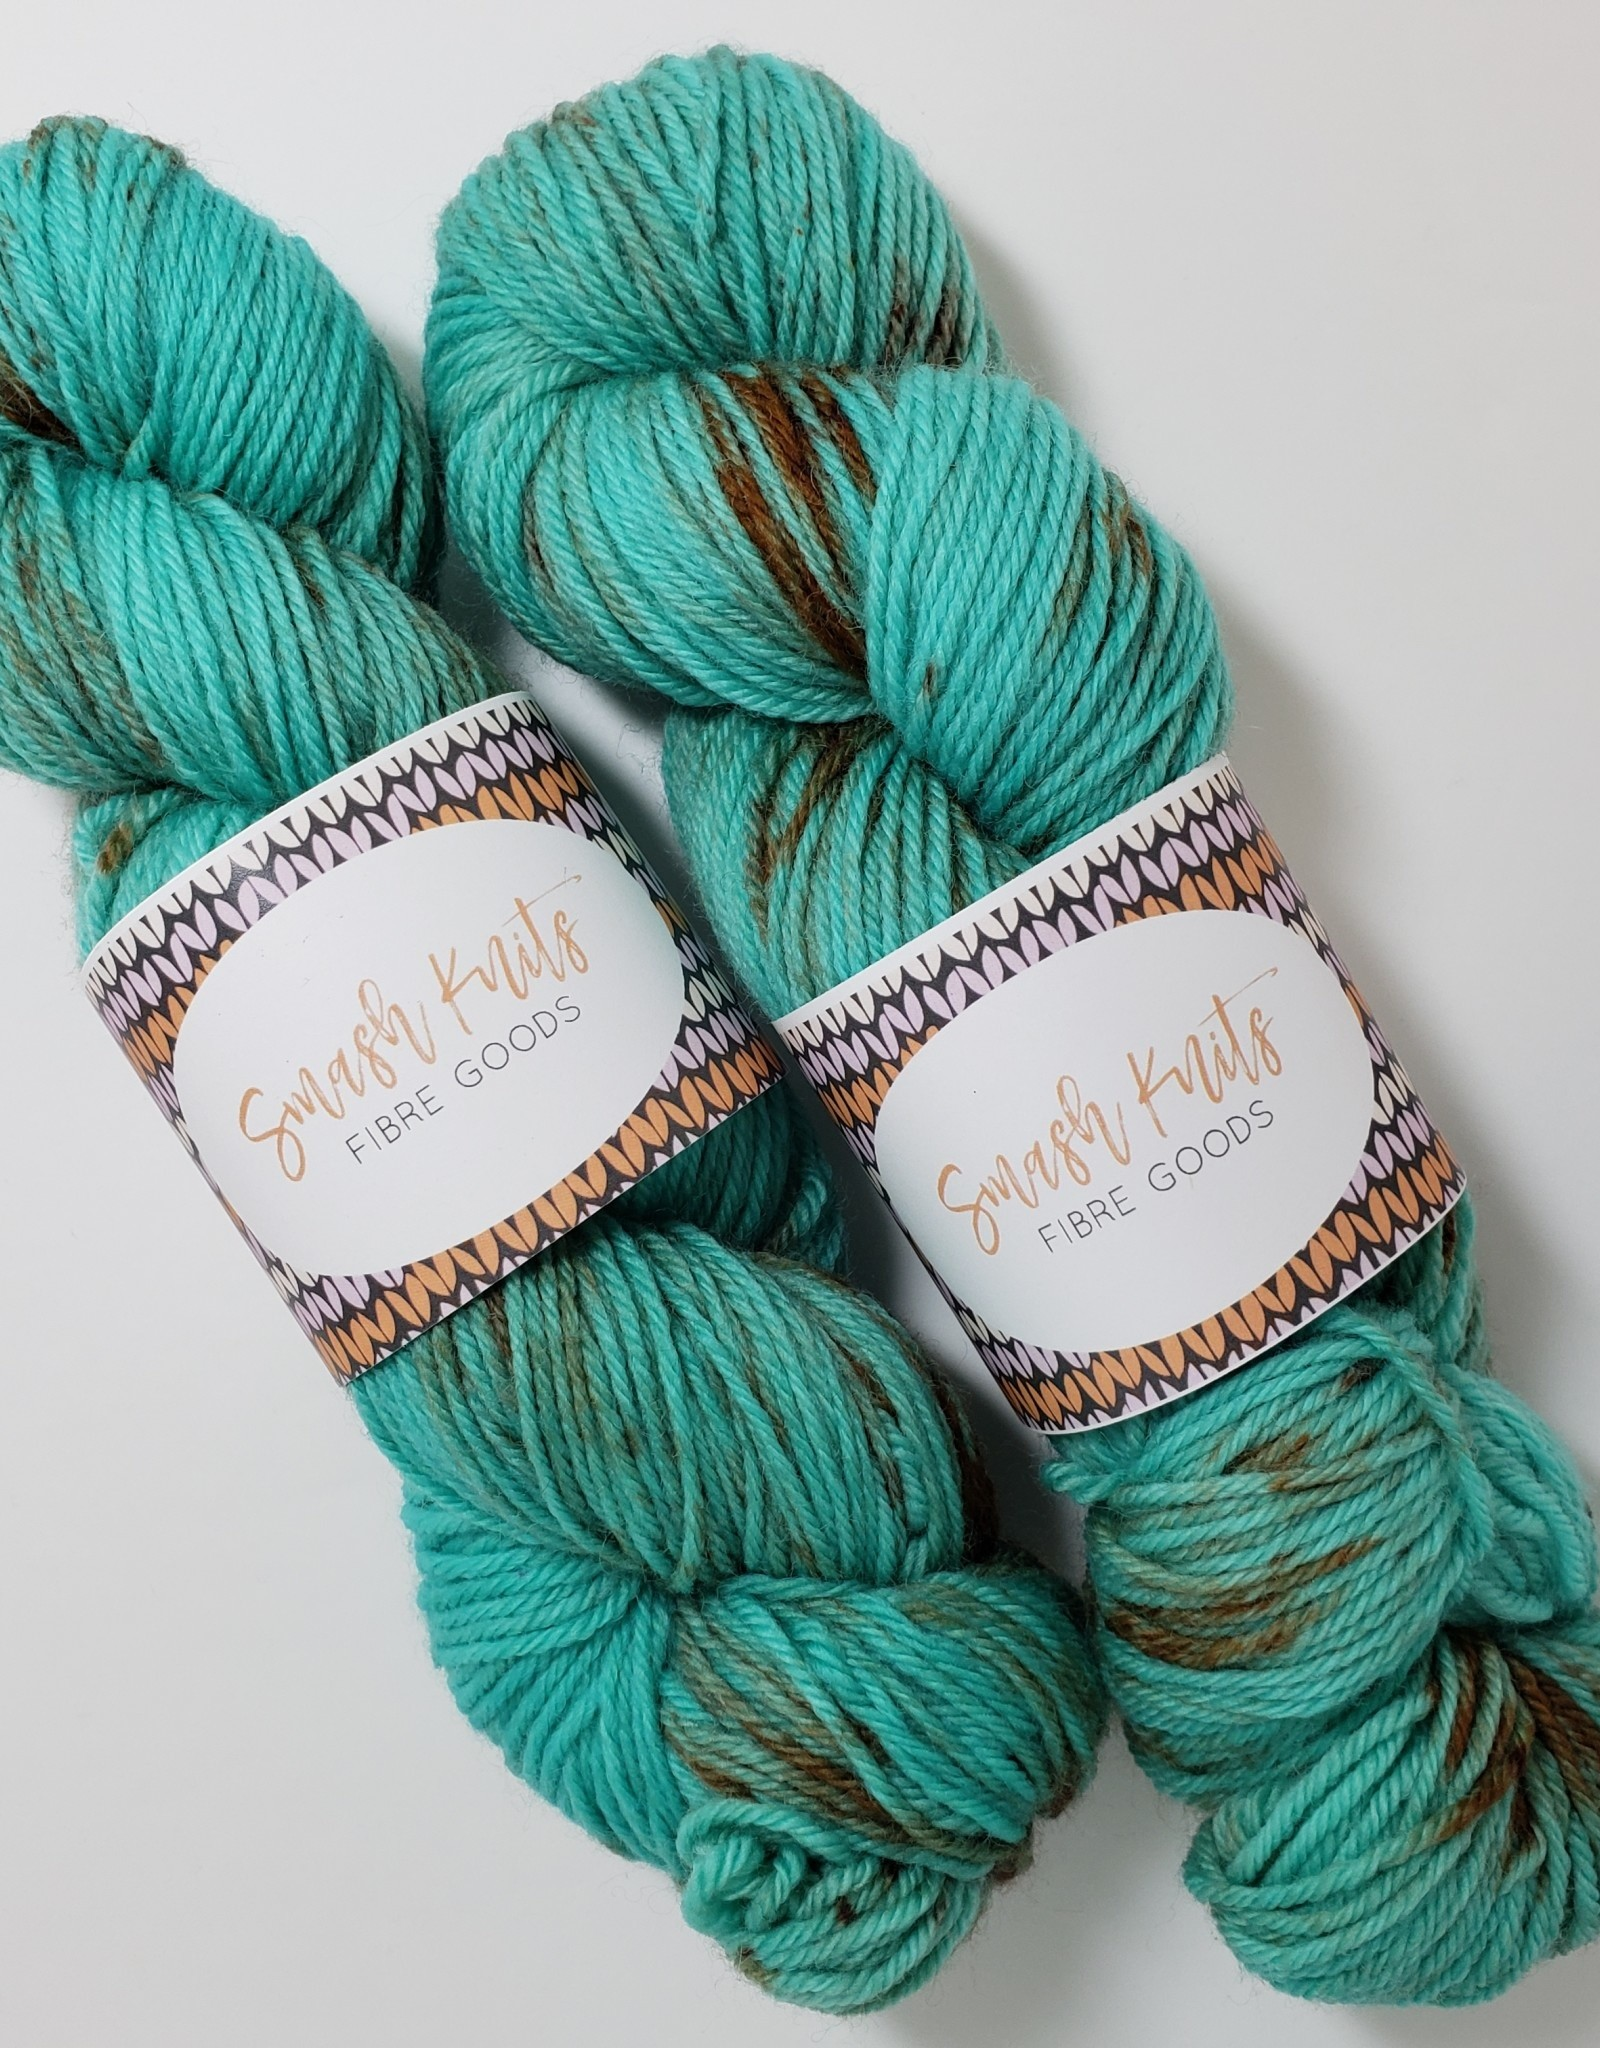 Smash Knits Smash Knits - Merino Nylon DK - Tarnished Turquoise